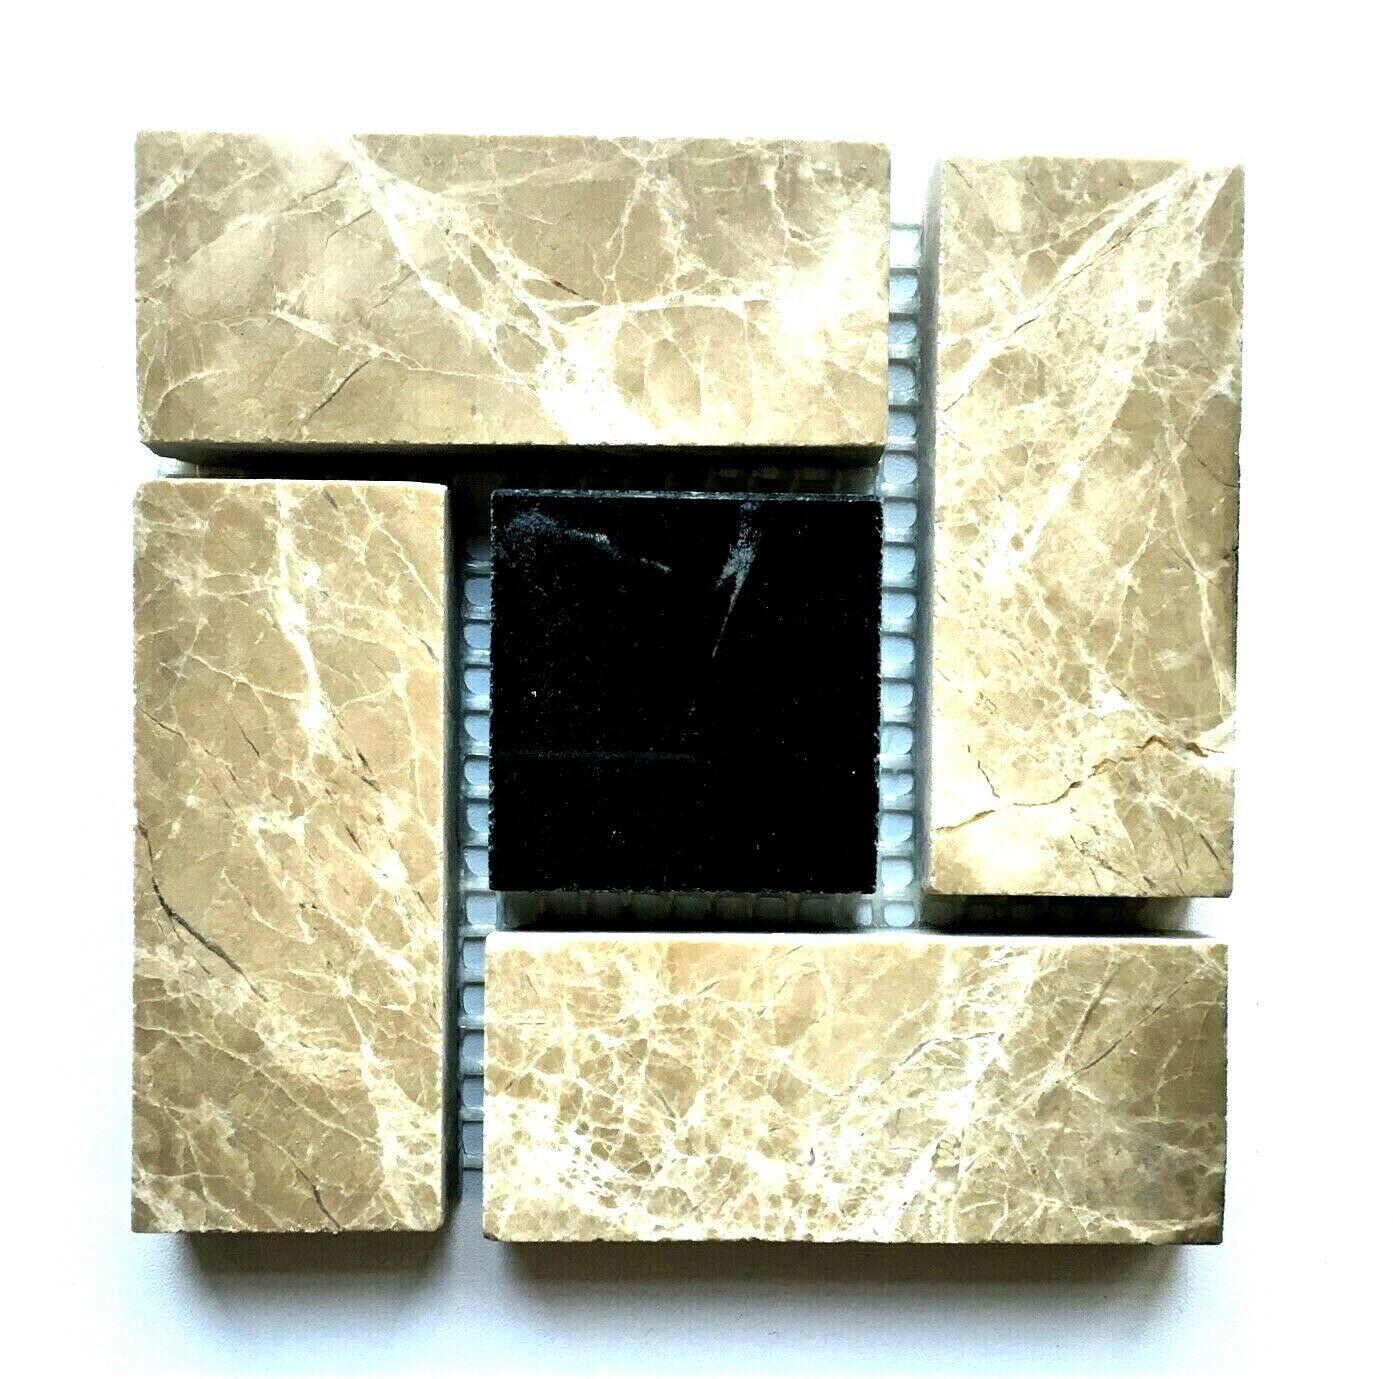 Pinwheel Emperador and Black Marble 4x4 Decorative Insert Wall Tile Backsplash